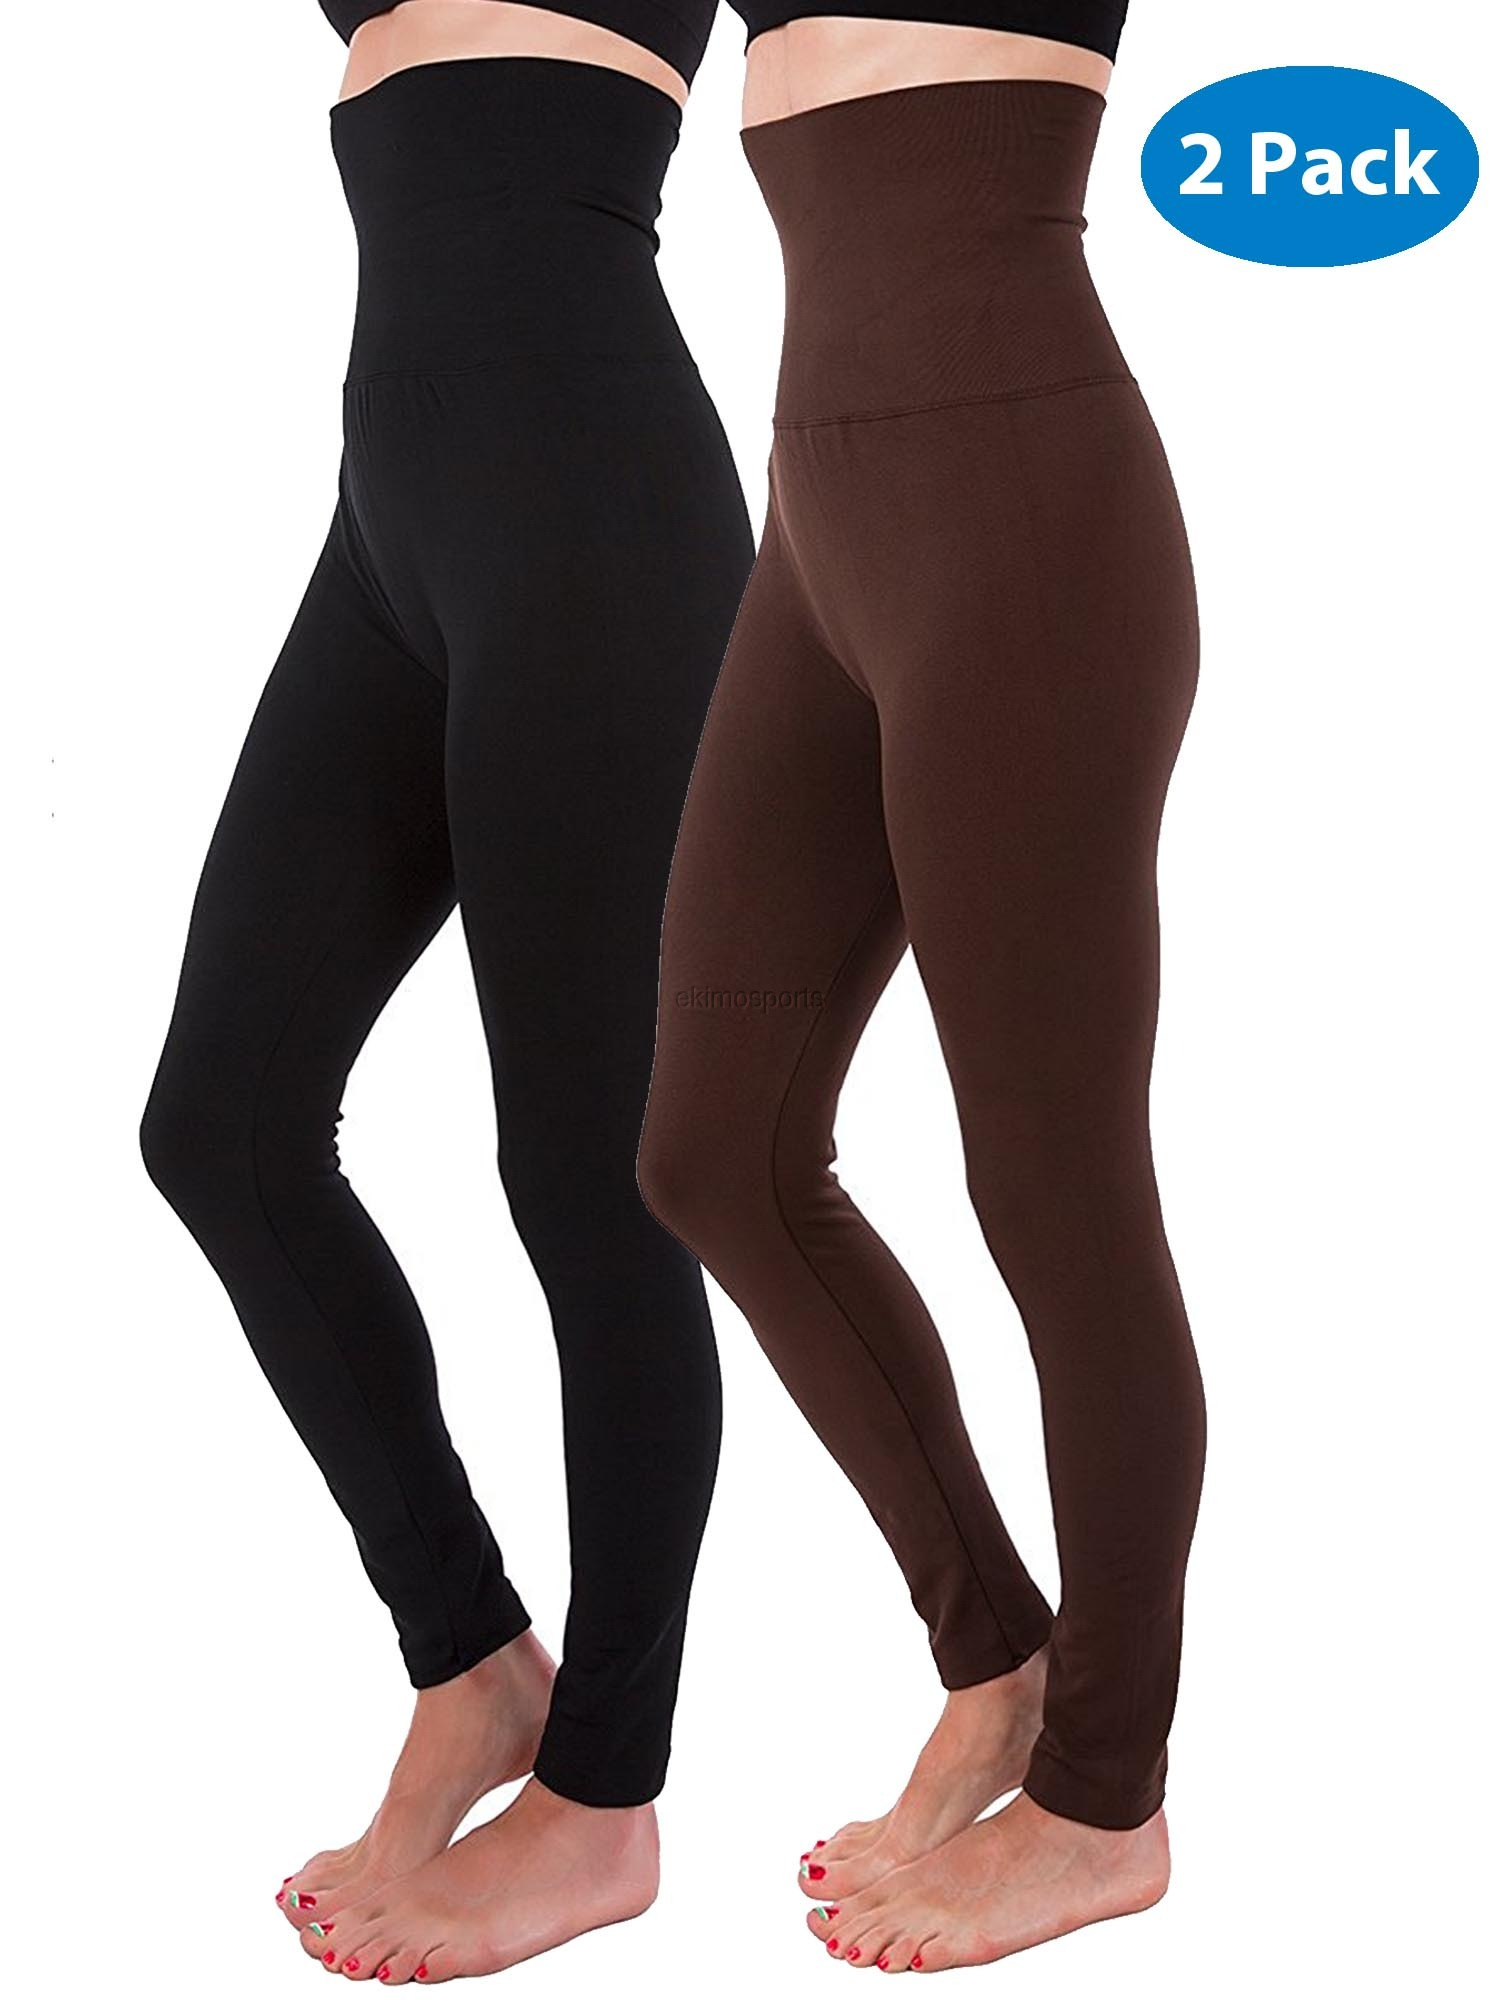 70829b120f N&J Kuda-Moda - 2-Pack High Waist Tummy Control Full Length Legging  Compression Top Pants Fleece Lined - Walmart.com